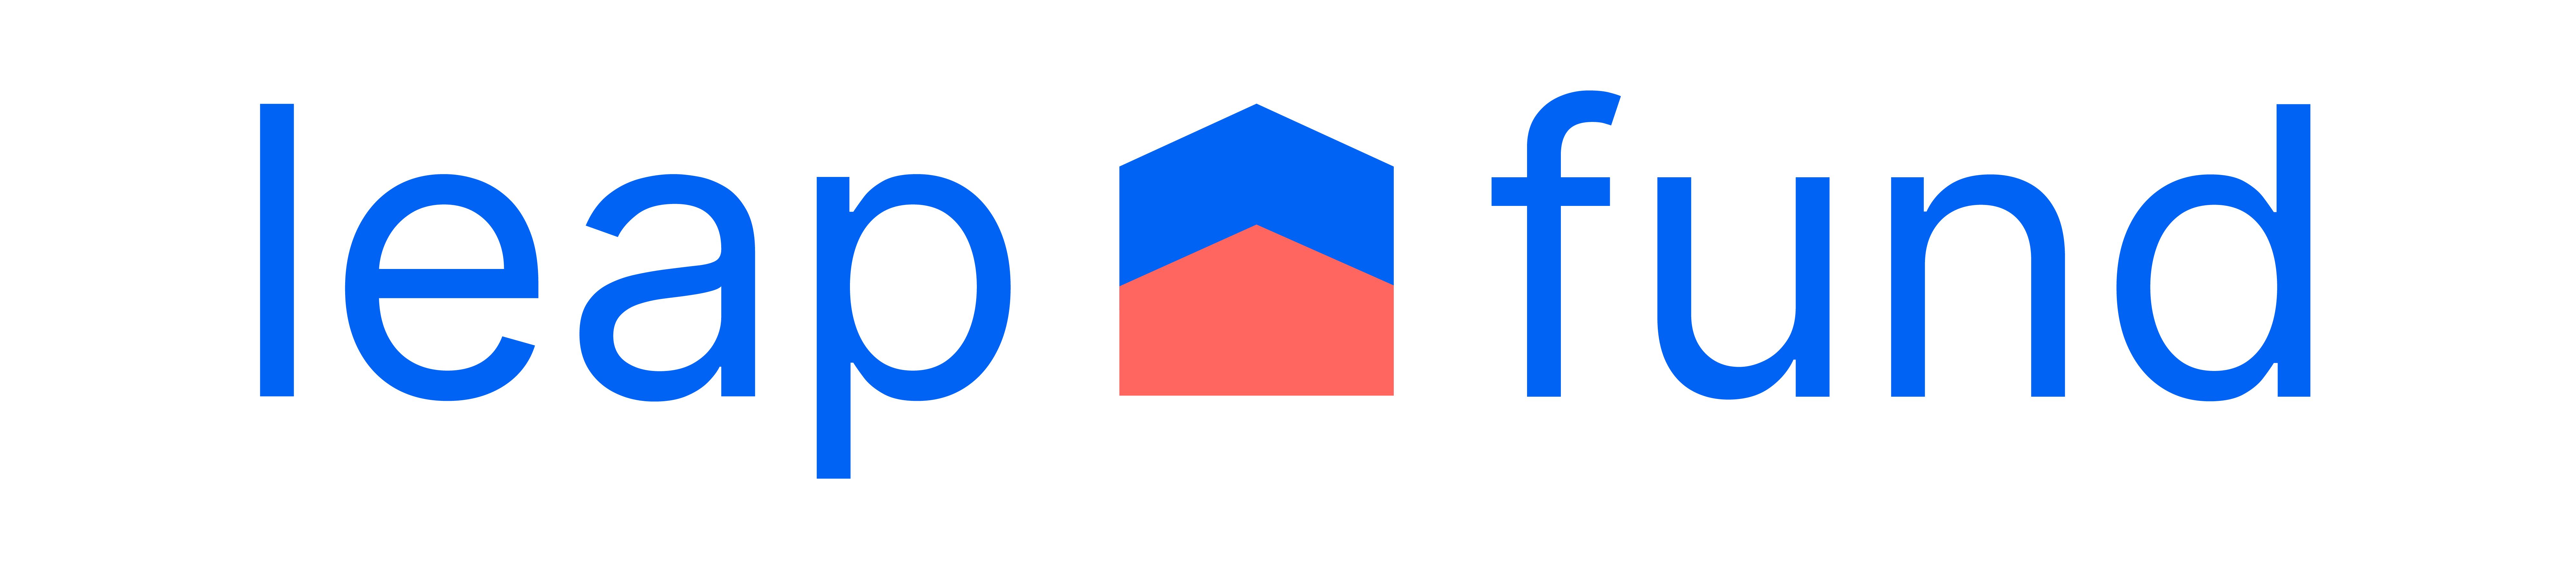 Leap Fund